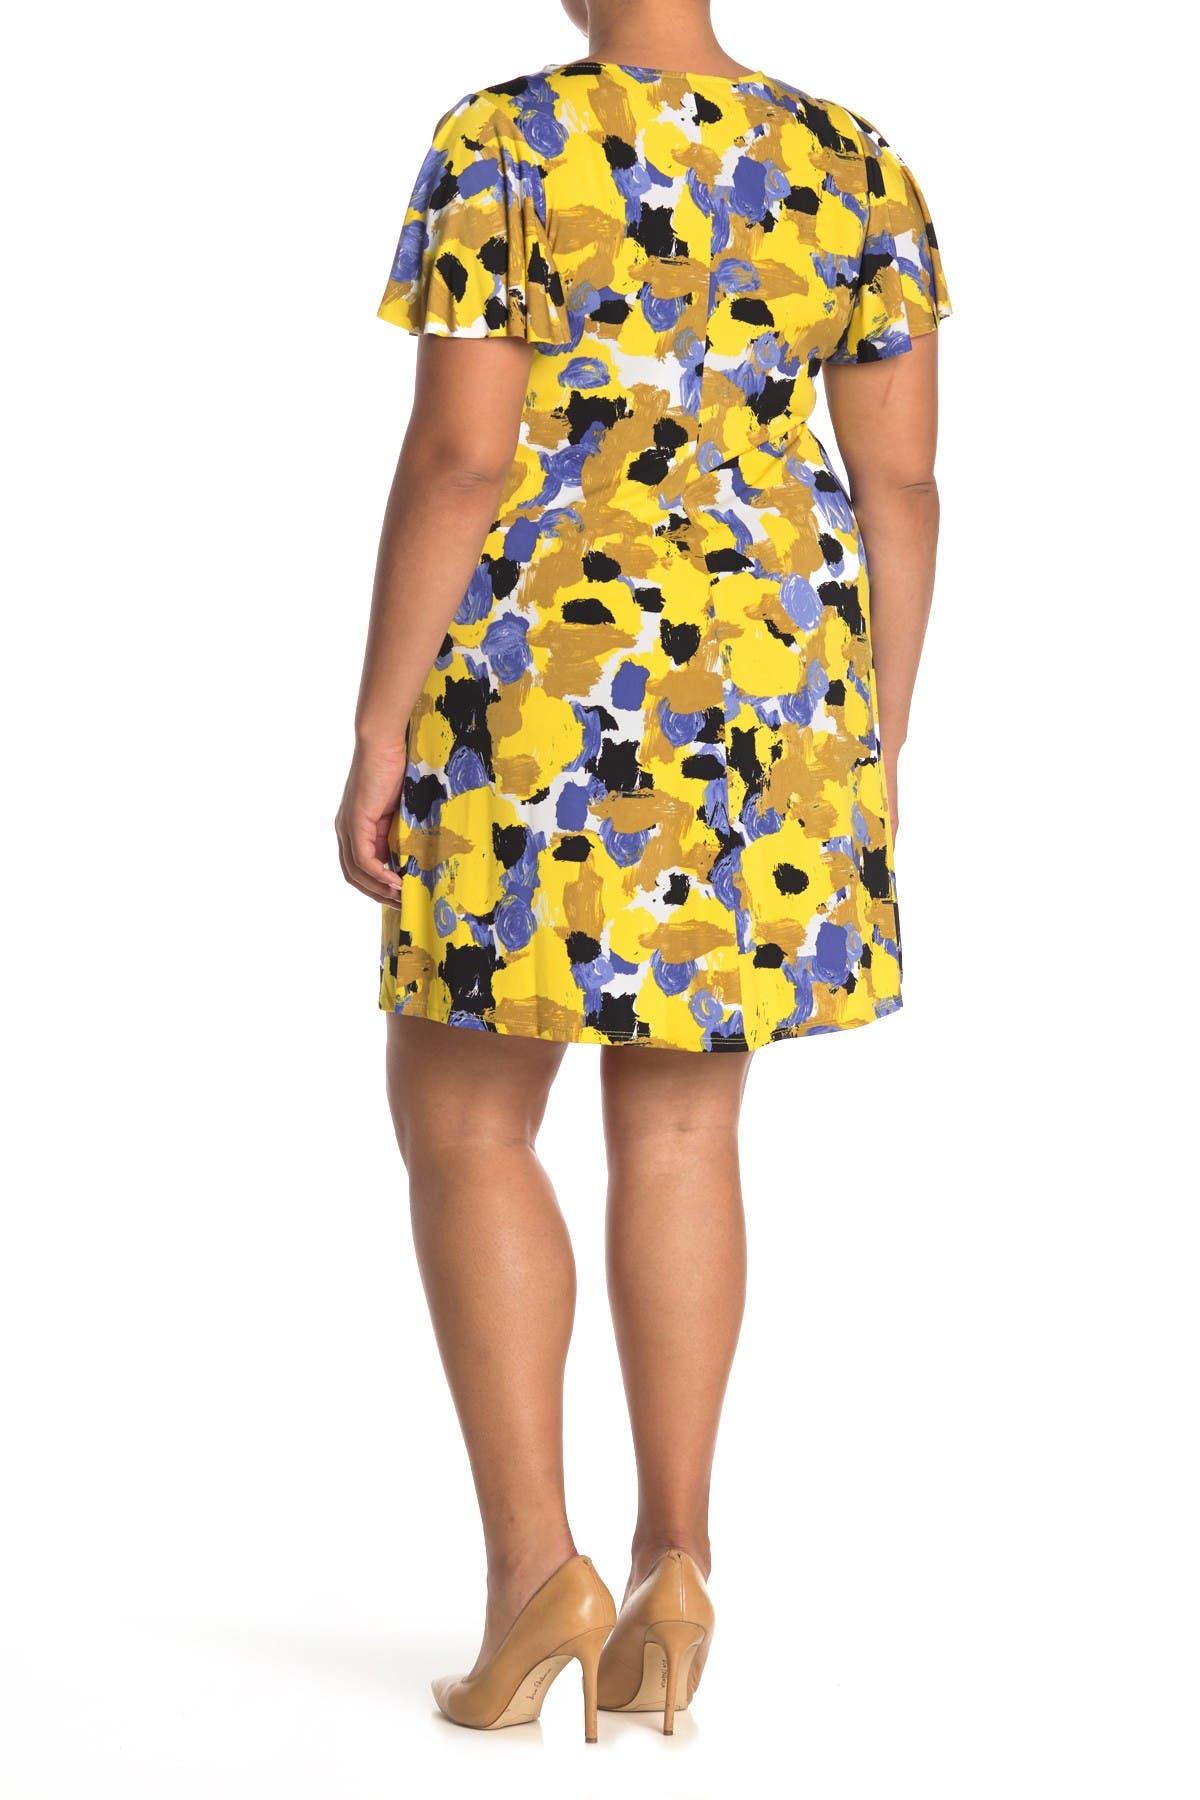 Image of TASH + SOPHIE Printed A-Line Dress